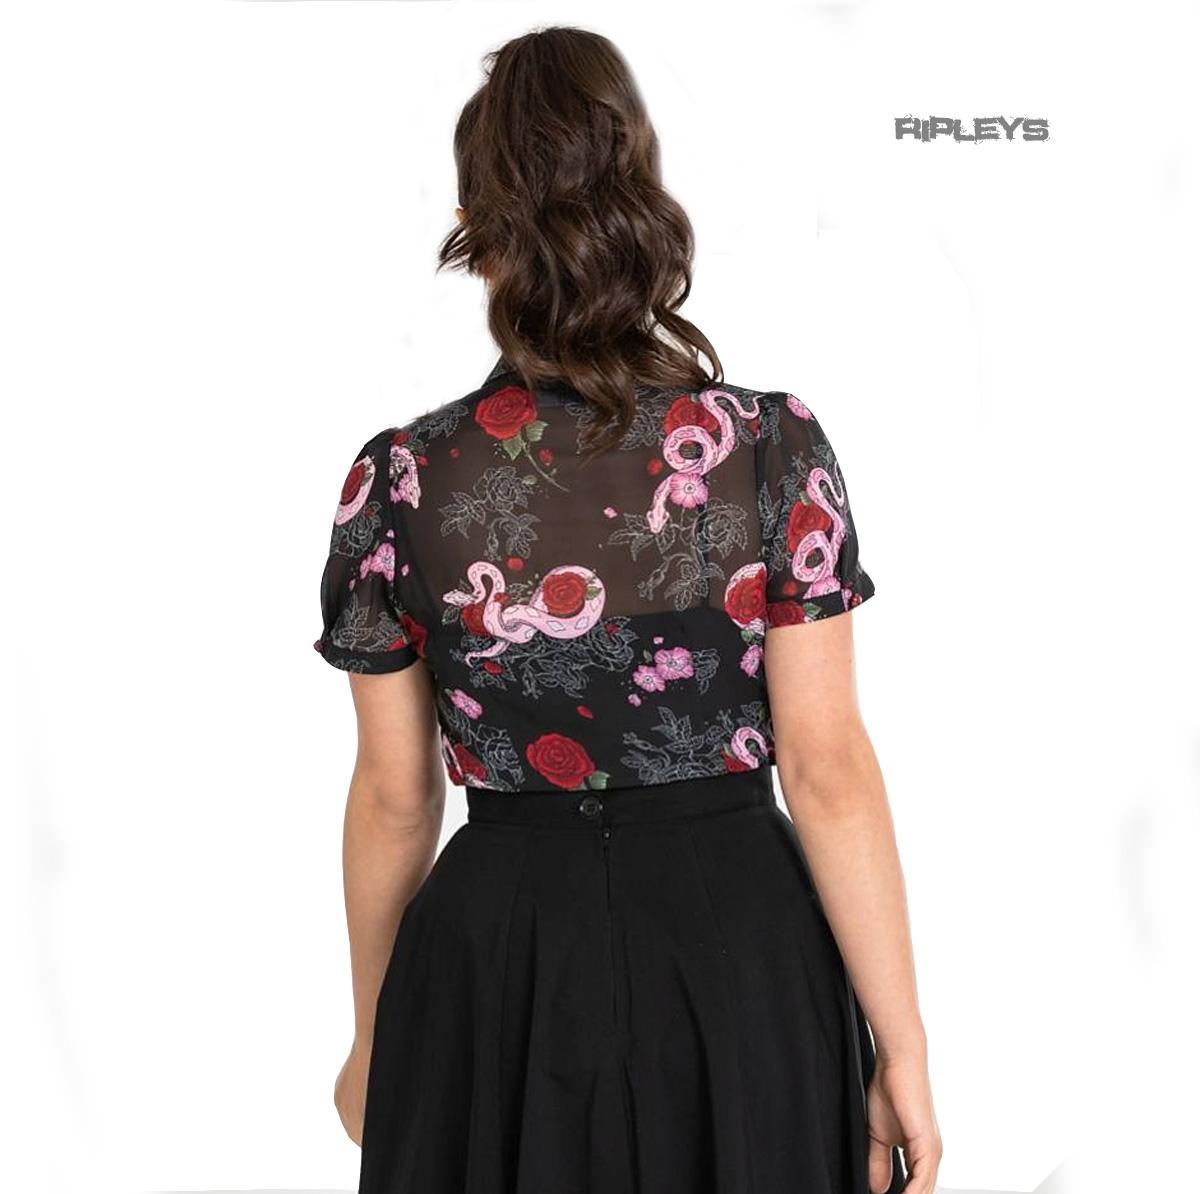 Hell-Bunny-Shirt-Gothic-Black-Top-MEDUSA-Blouse-Snakes-amp-Roses-All-Sizes thumbnail 28